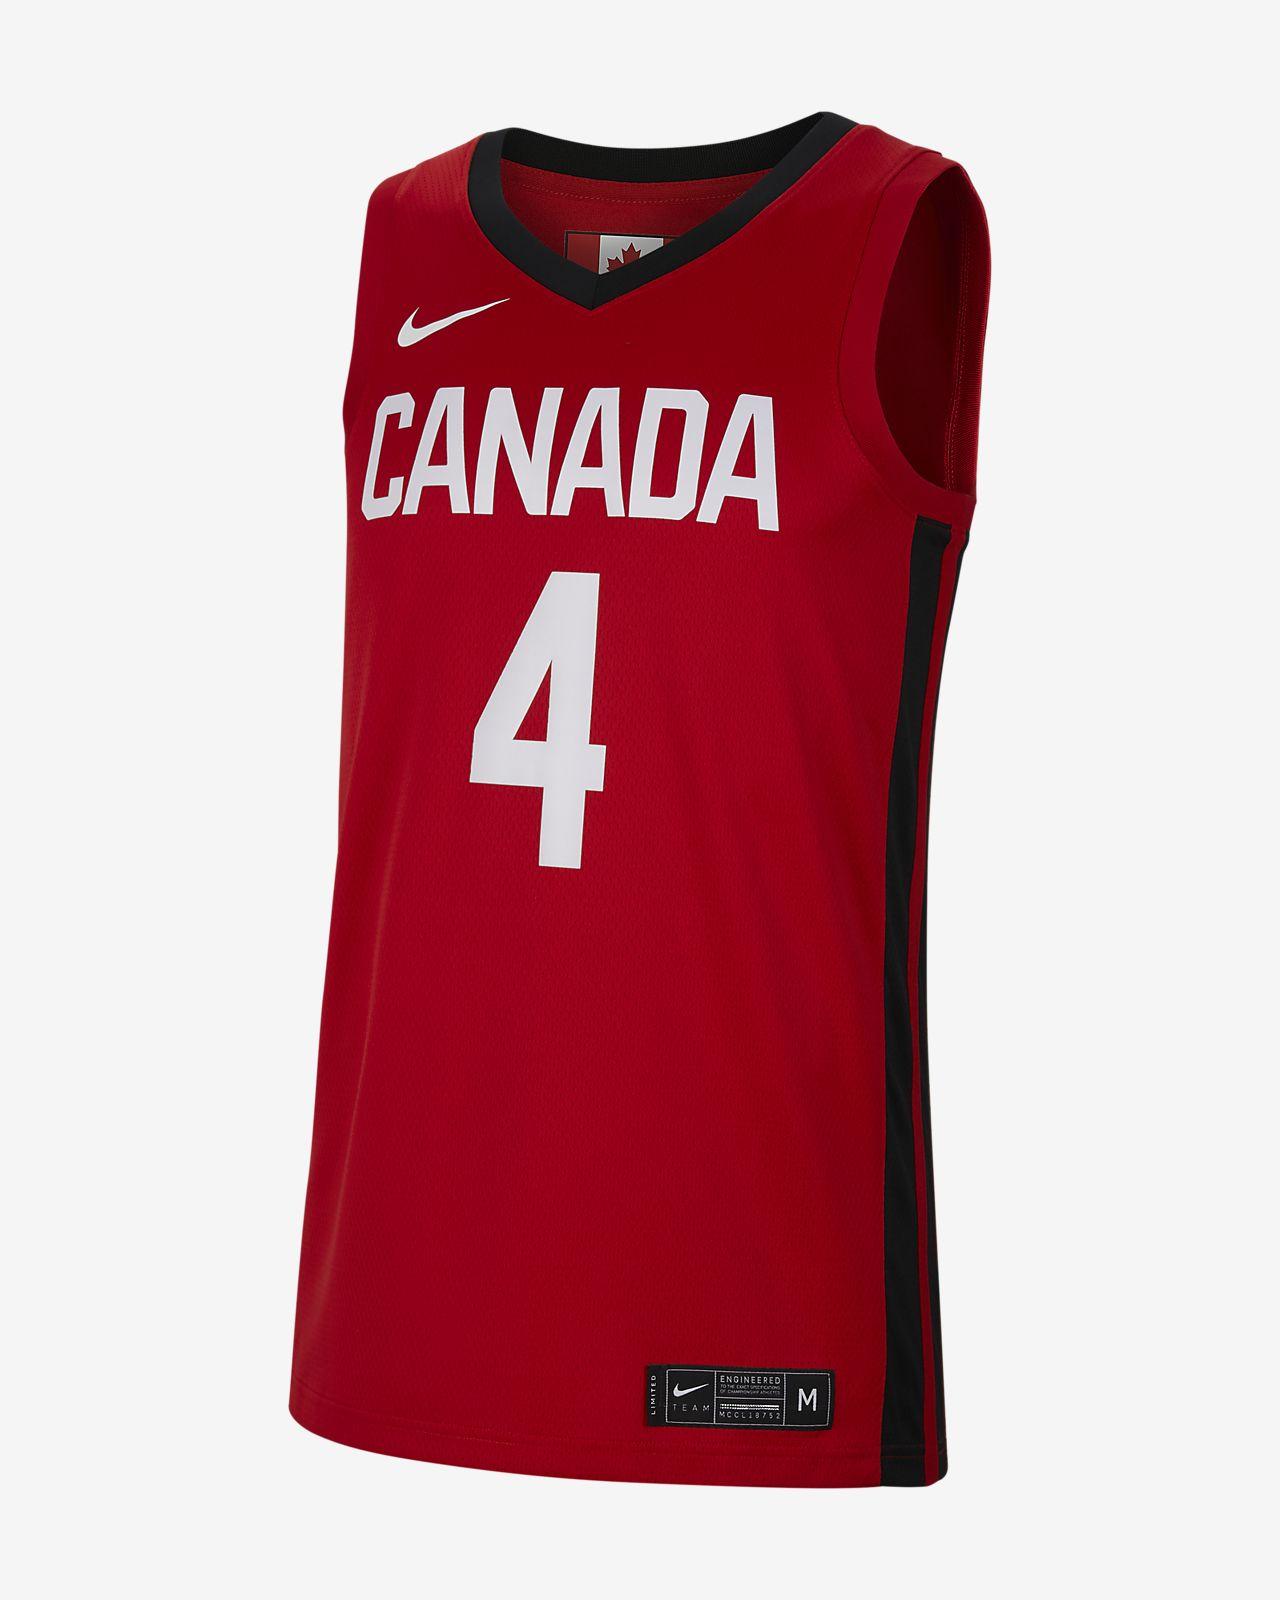 Canada Nike (Road) férfi kosárlabdamez